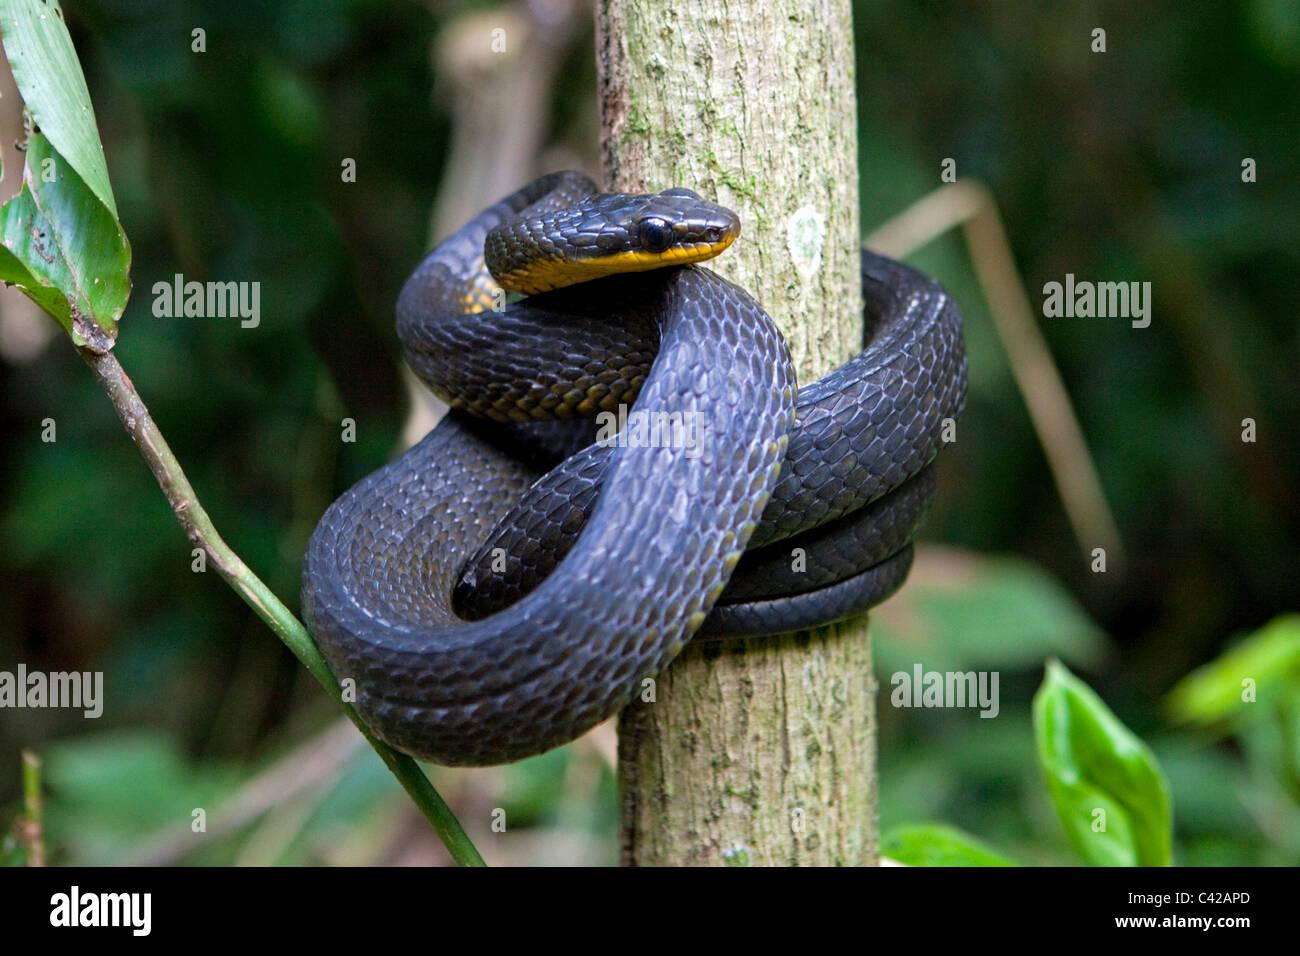 Peru, Cruz de Mayo, Manu National Park, UNESCO World Heritage Site, Pantiacolla mountains. Snake. Stock Photo